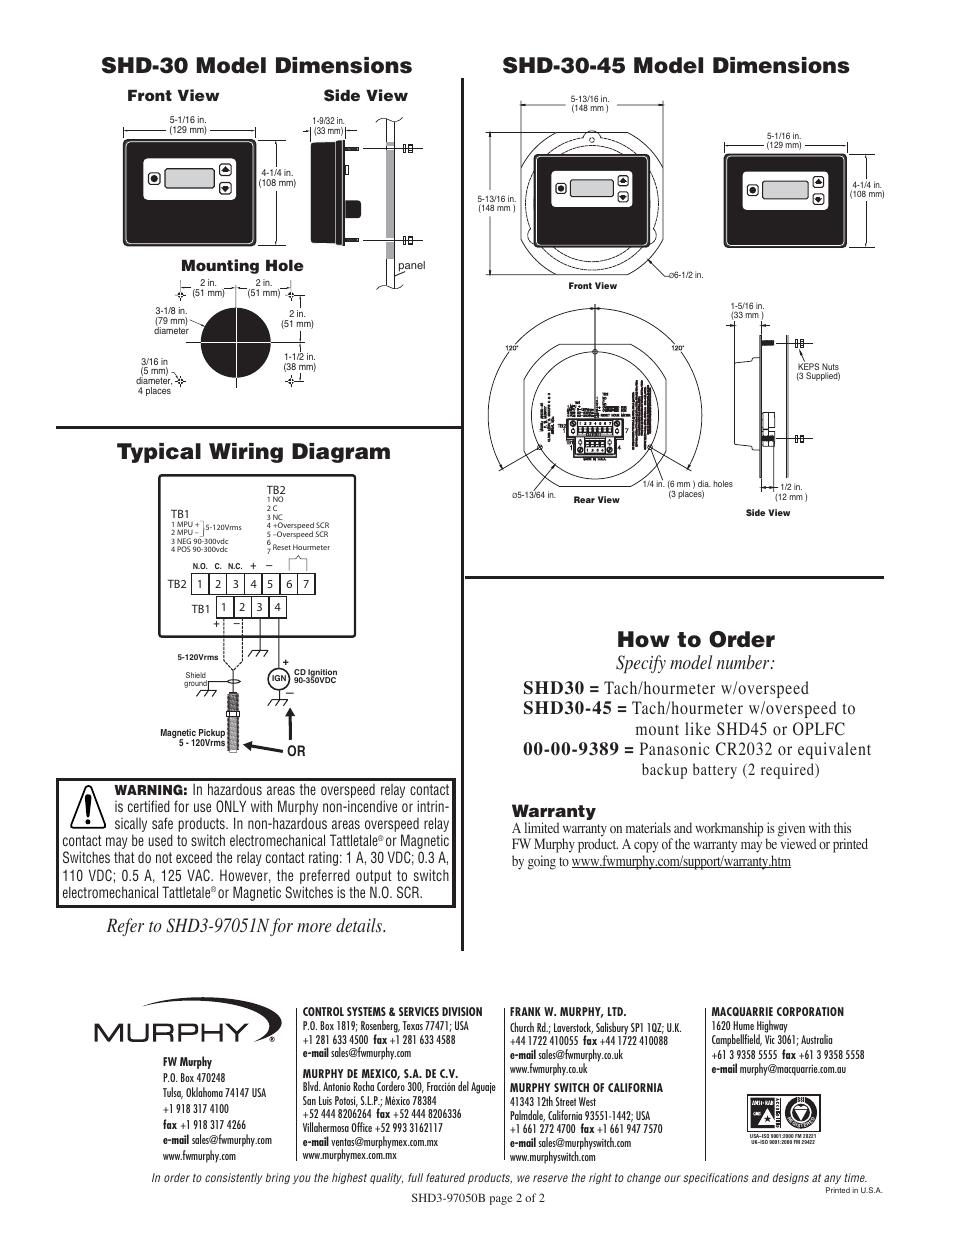 Typical Wiring Diagram Shd